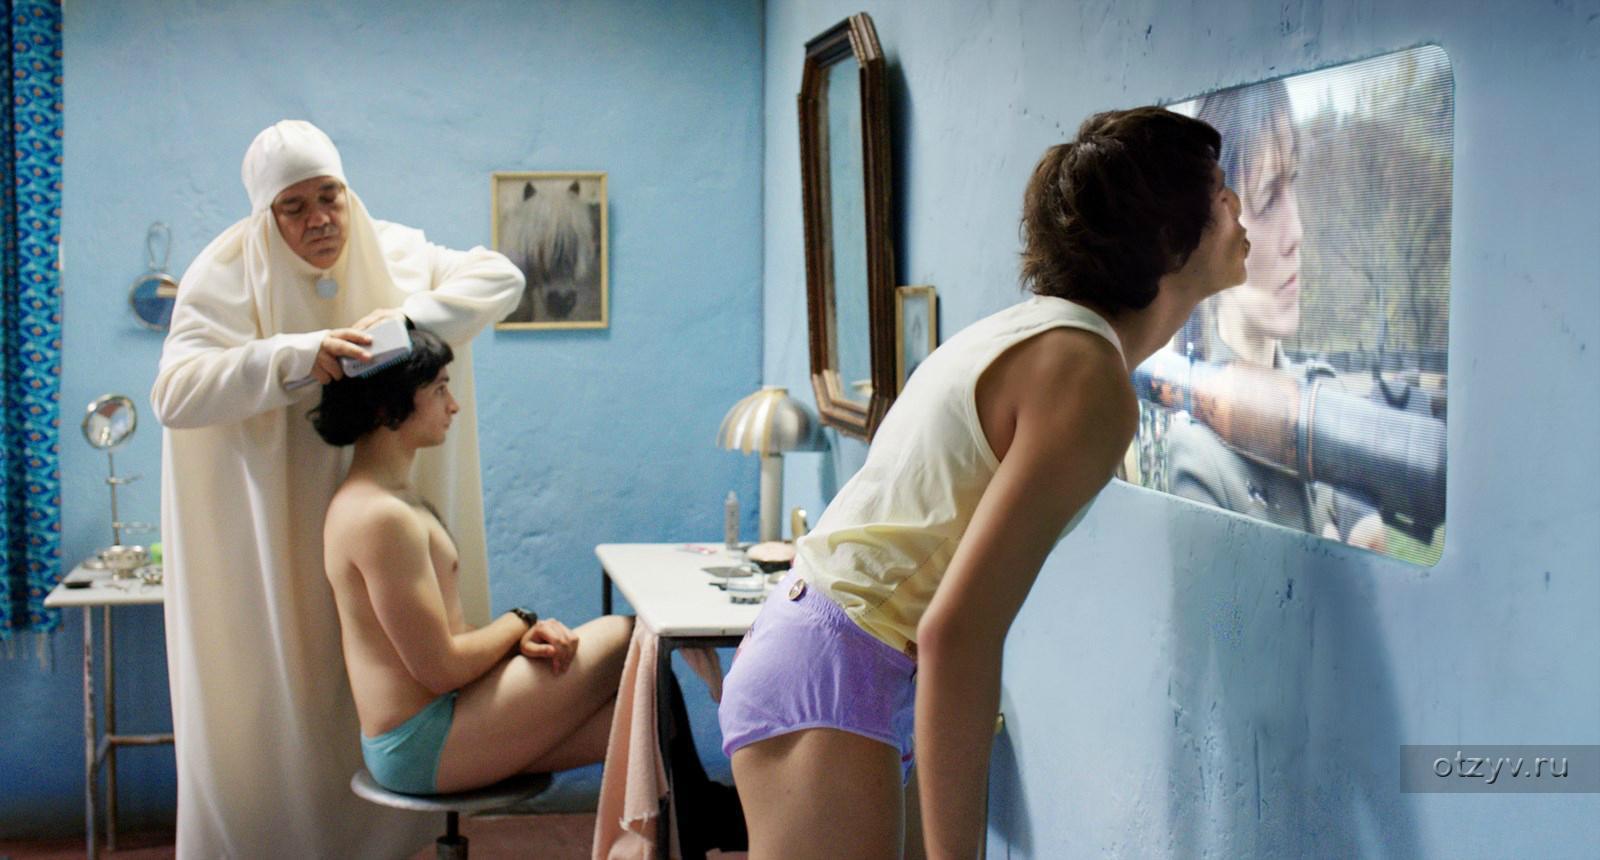 porno-film-seks-v-korolevstve-intimnoe-video-devushek-iz-ekaterinburga